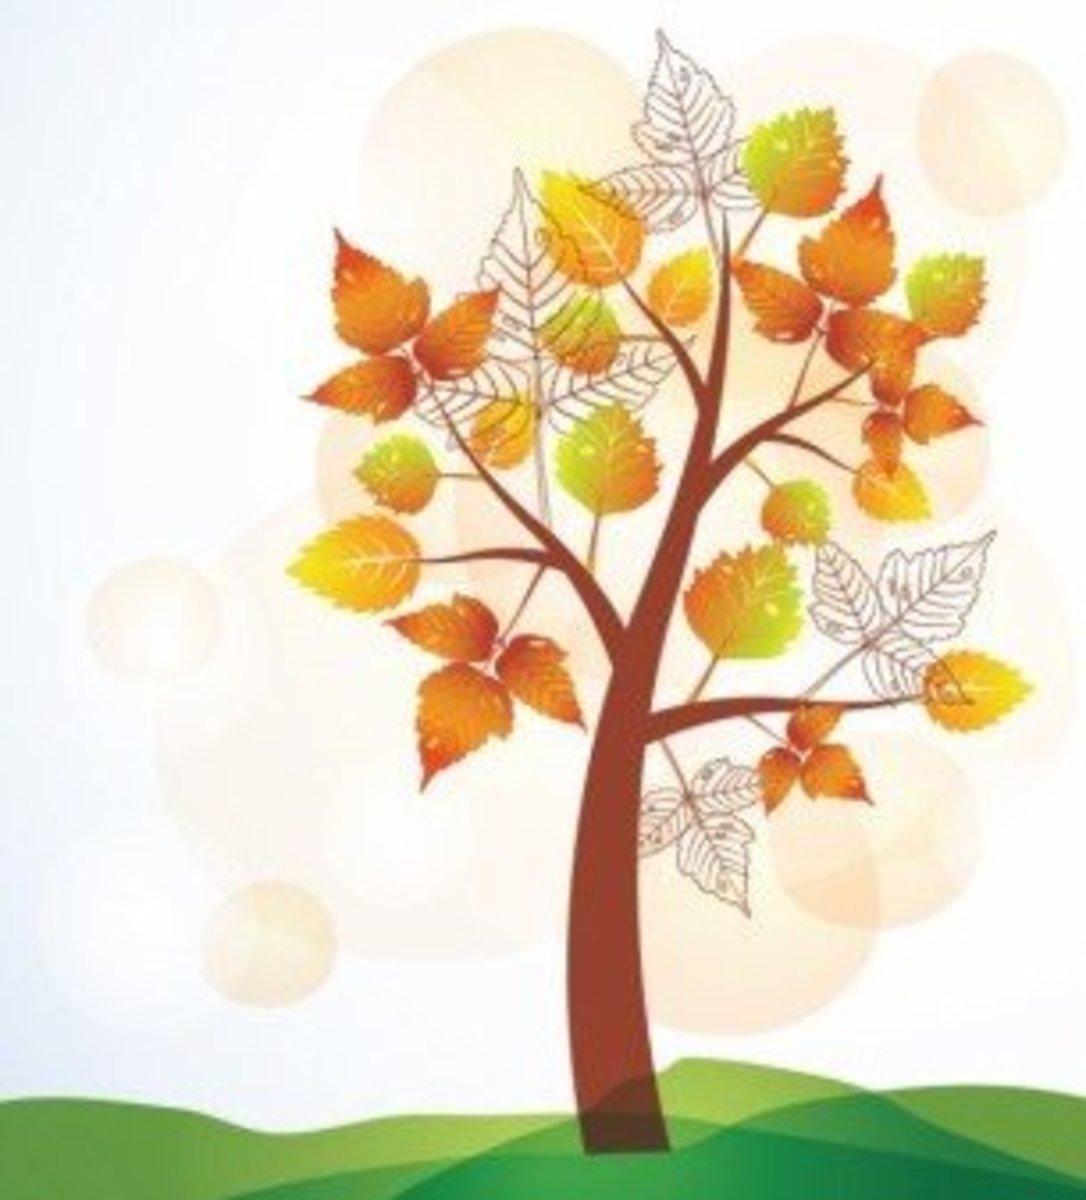 Elm Tree in Autumn